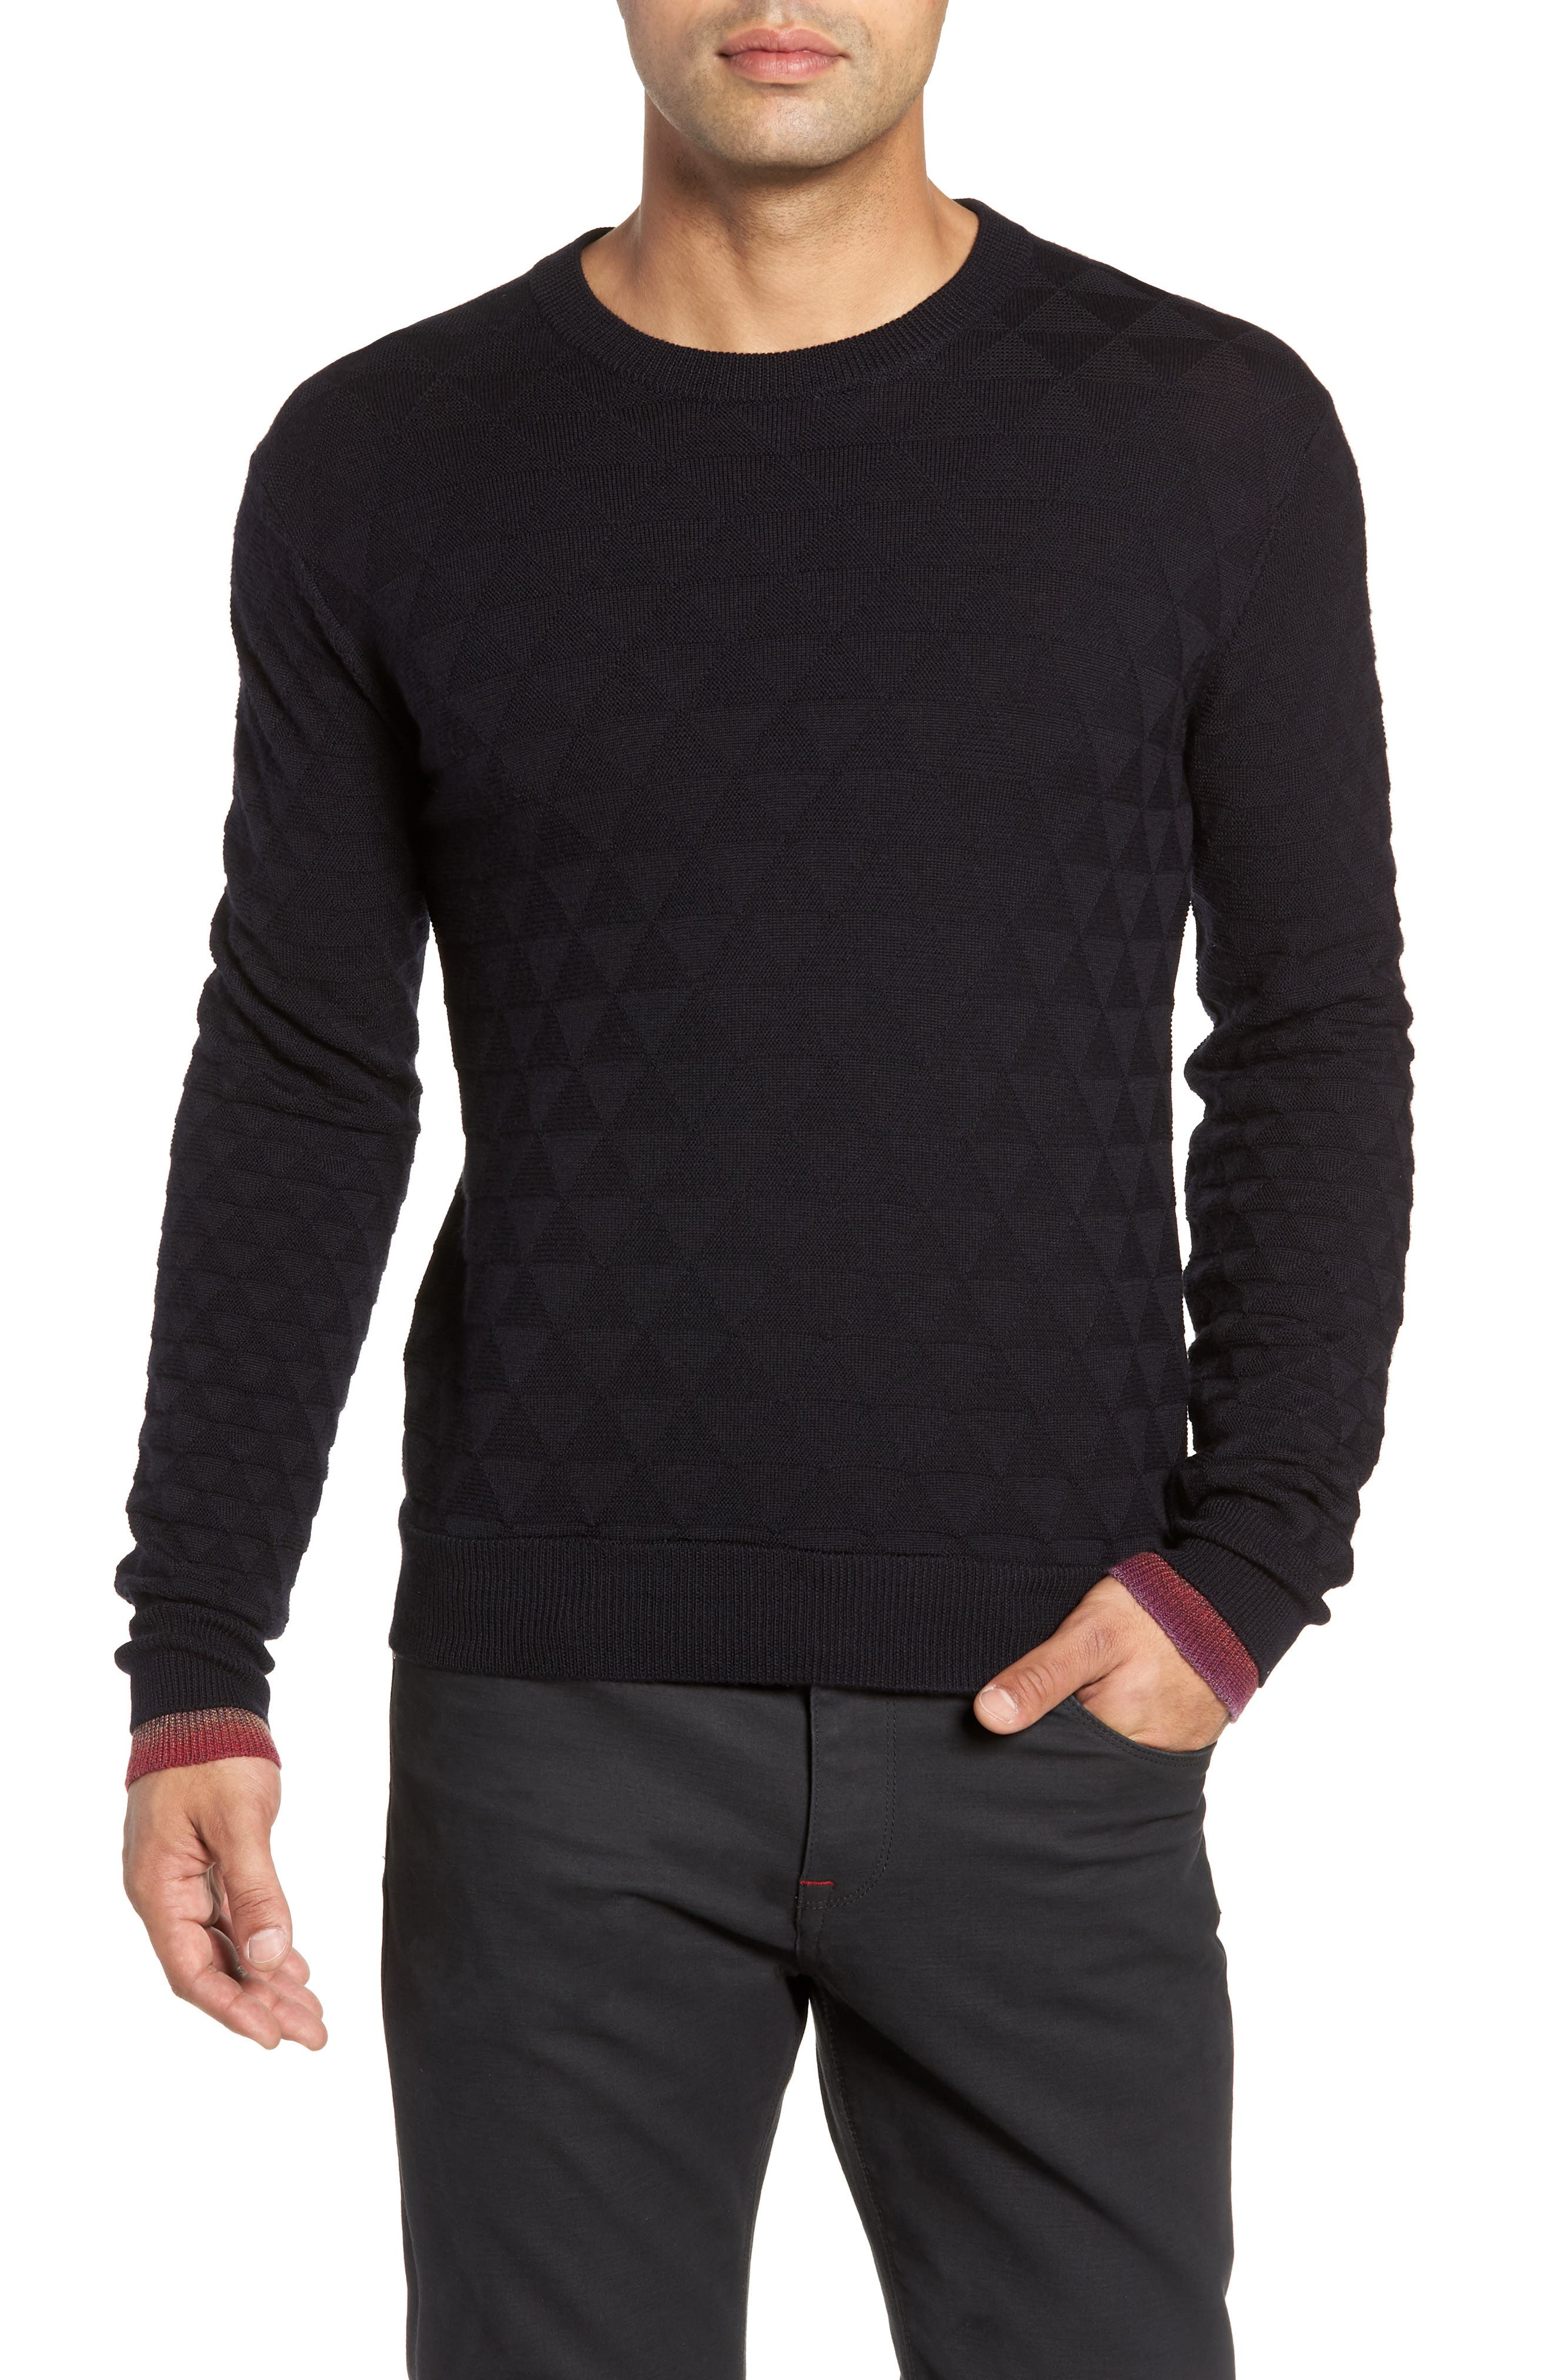 Blackburn Classic Fit Sweater,                             Main thumbnail 1, color,                             BLACK